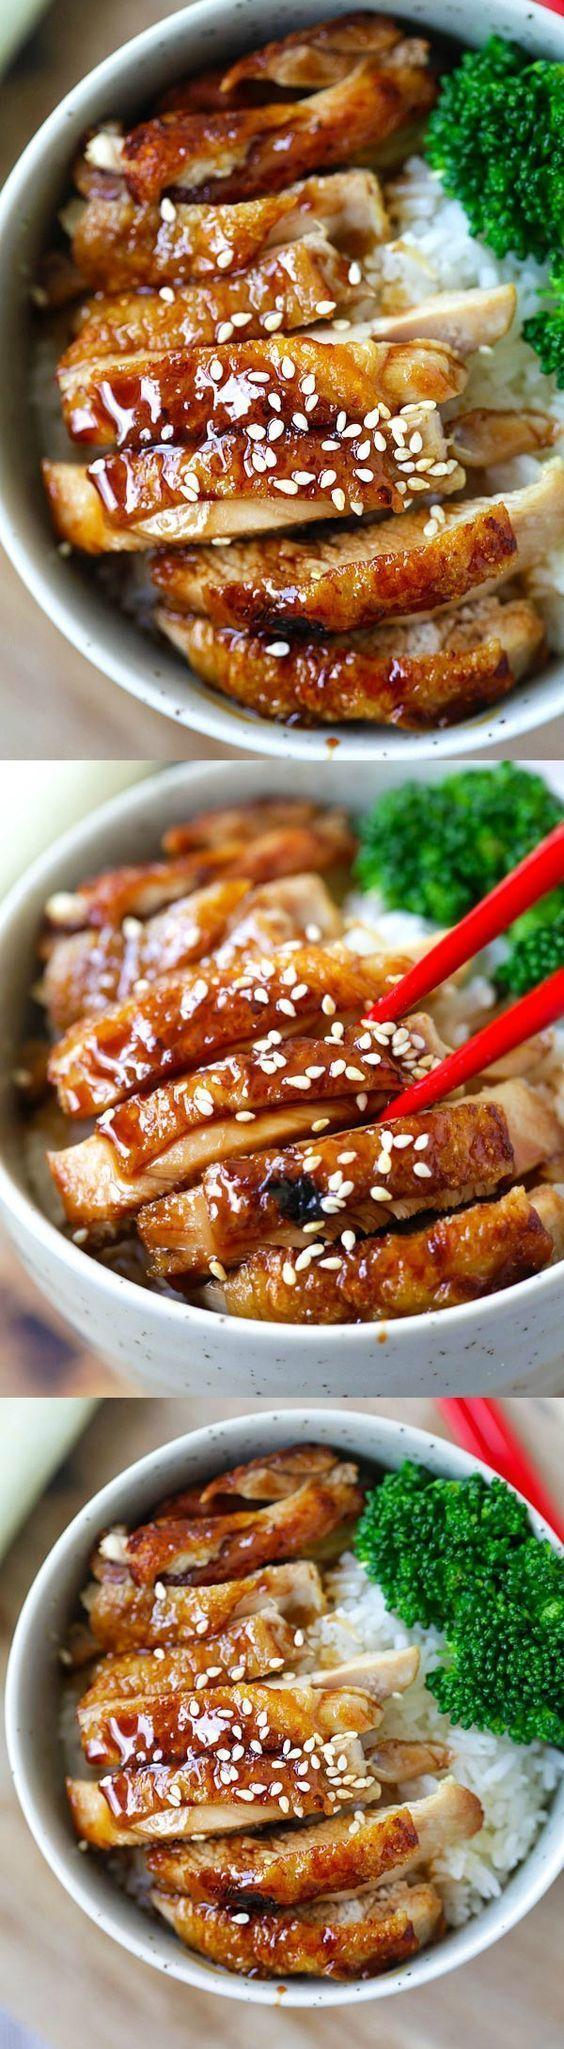 How to make chicken teriyaki – EASY recipe for teriyaki sauce plus chicken teriyaki that tastes like Japanese restaurants   http://rasamalaysia.com